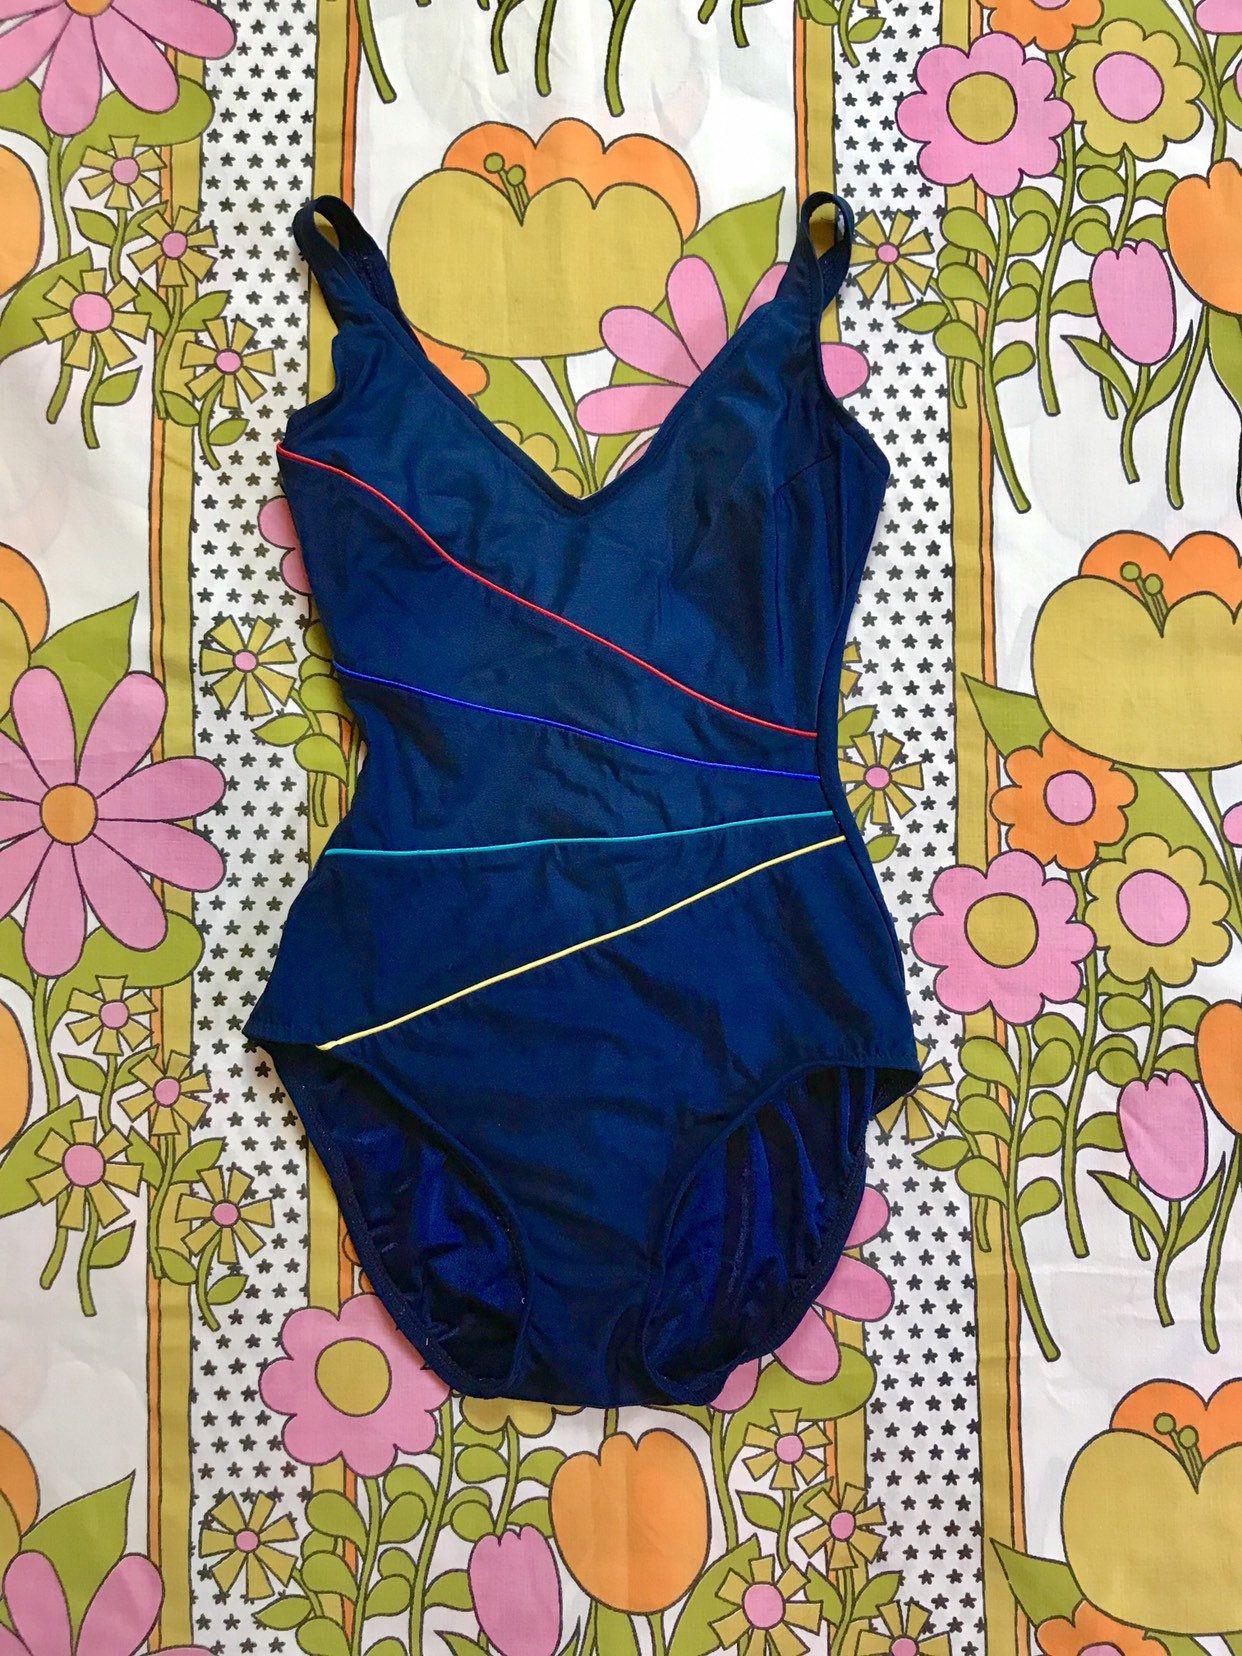 bc670c1dd49 Vintage 70s 80s navy blue rainbow striped one piece swimsuit XS/S Robby Len  retro